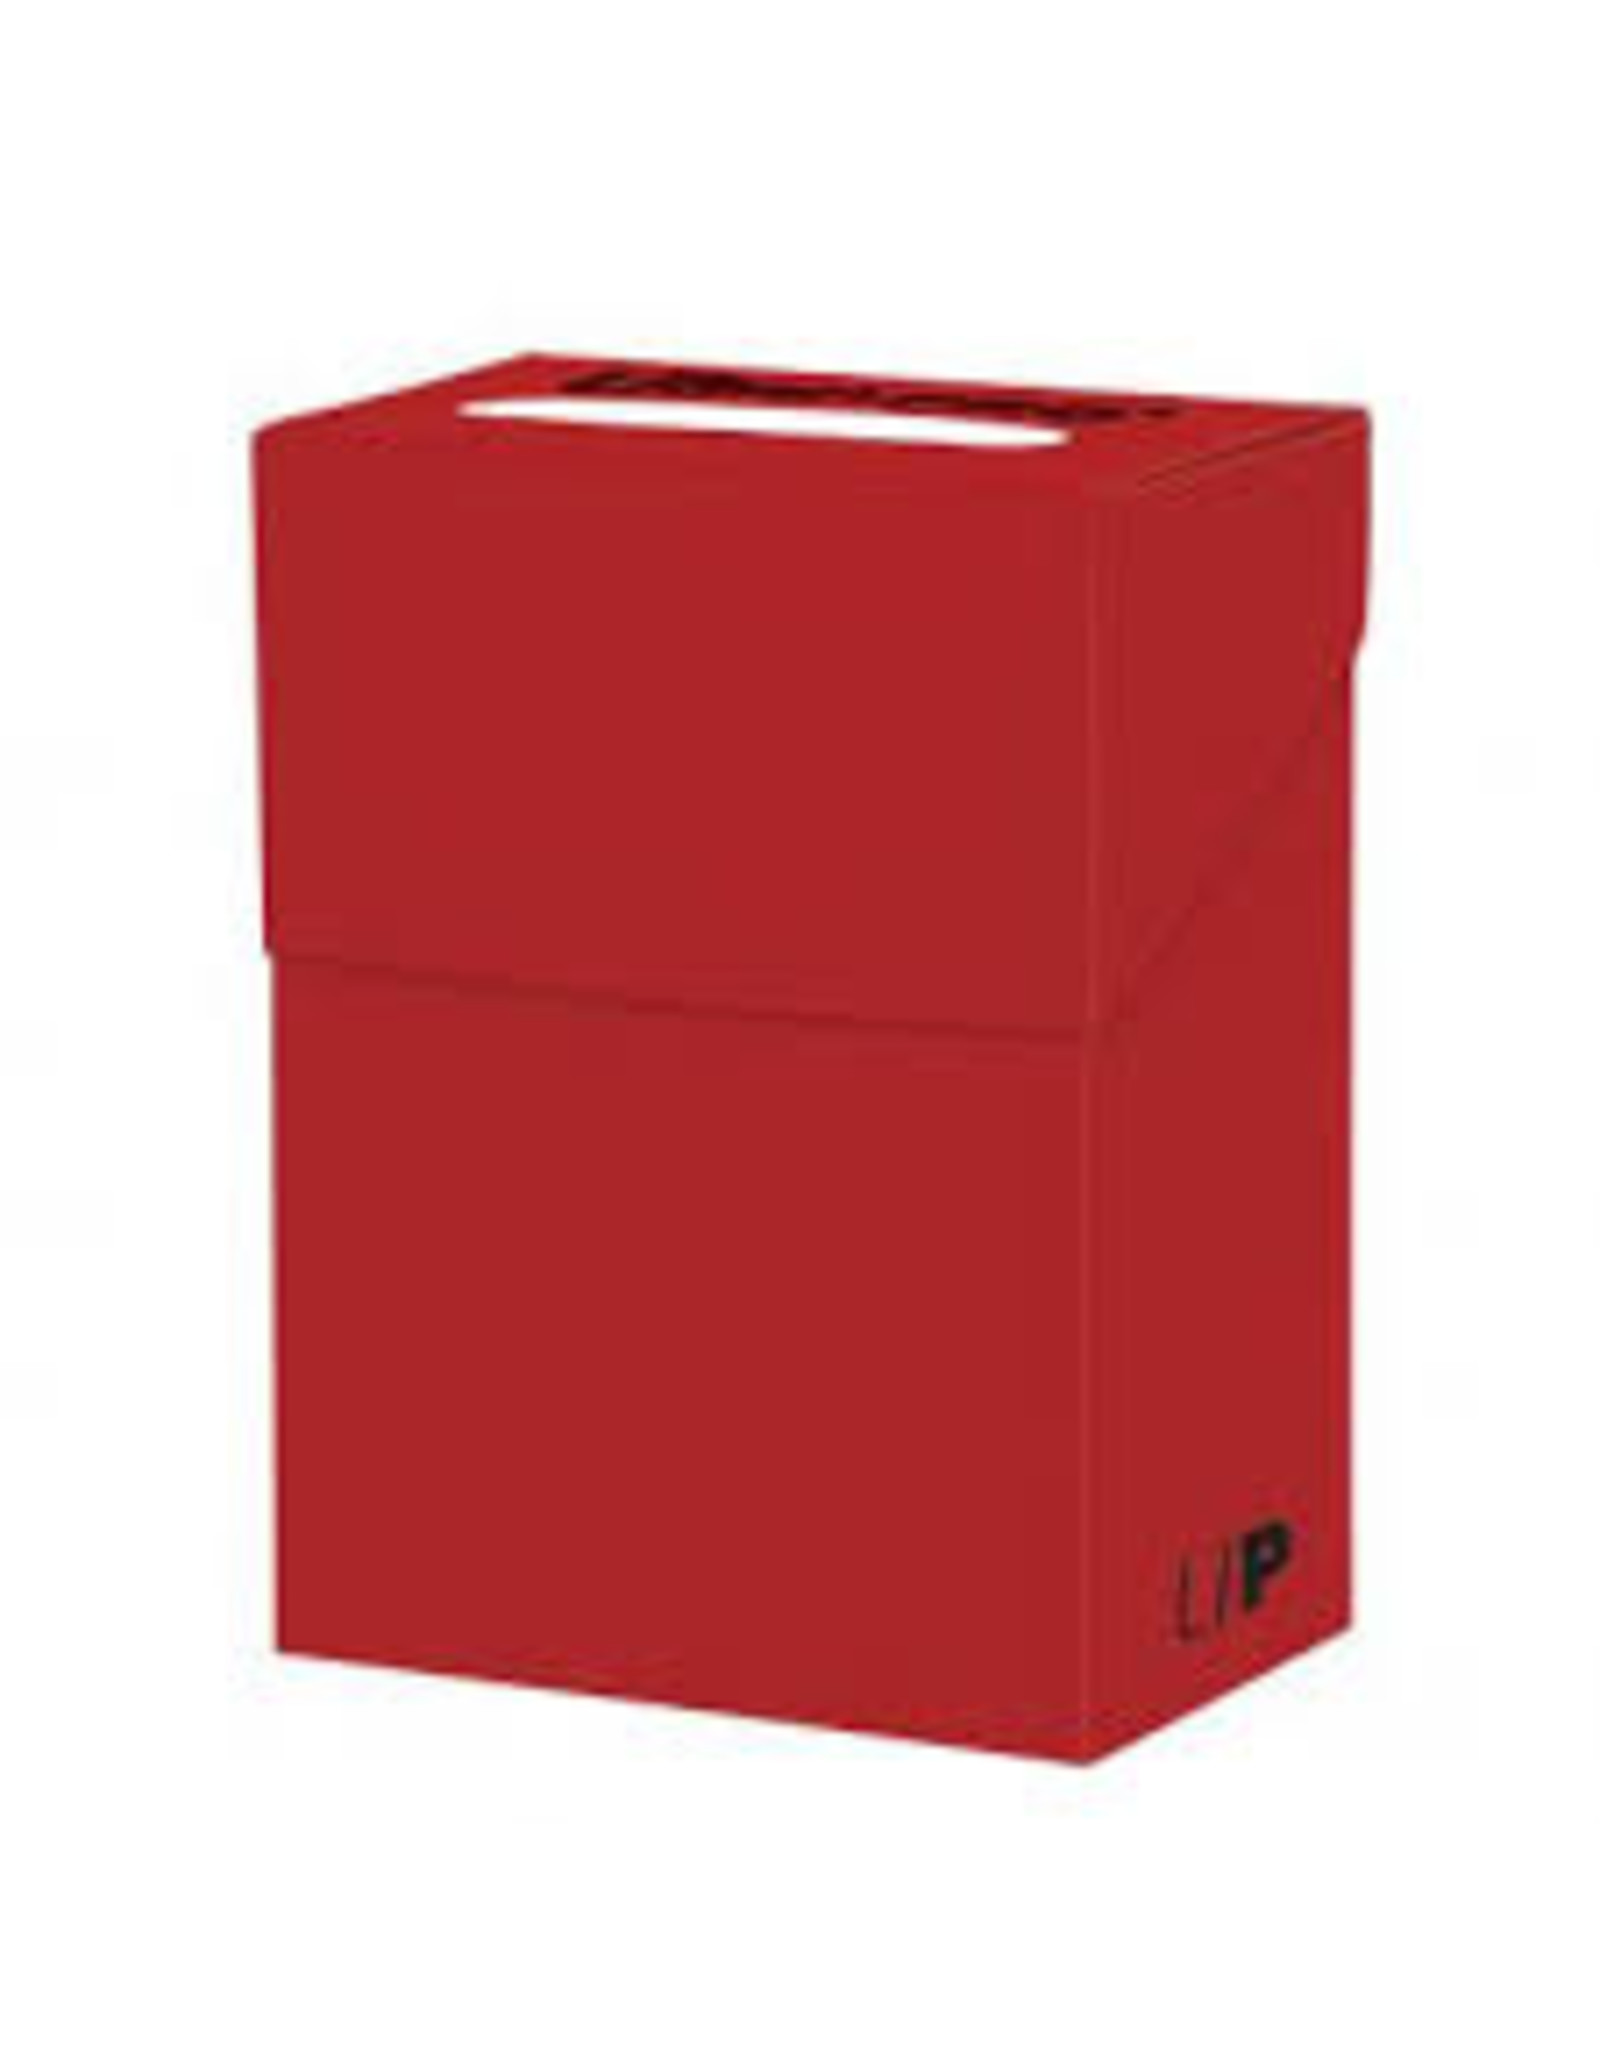 ULTRA PRO Deck box dark red